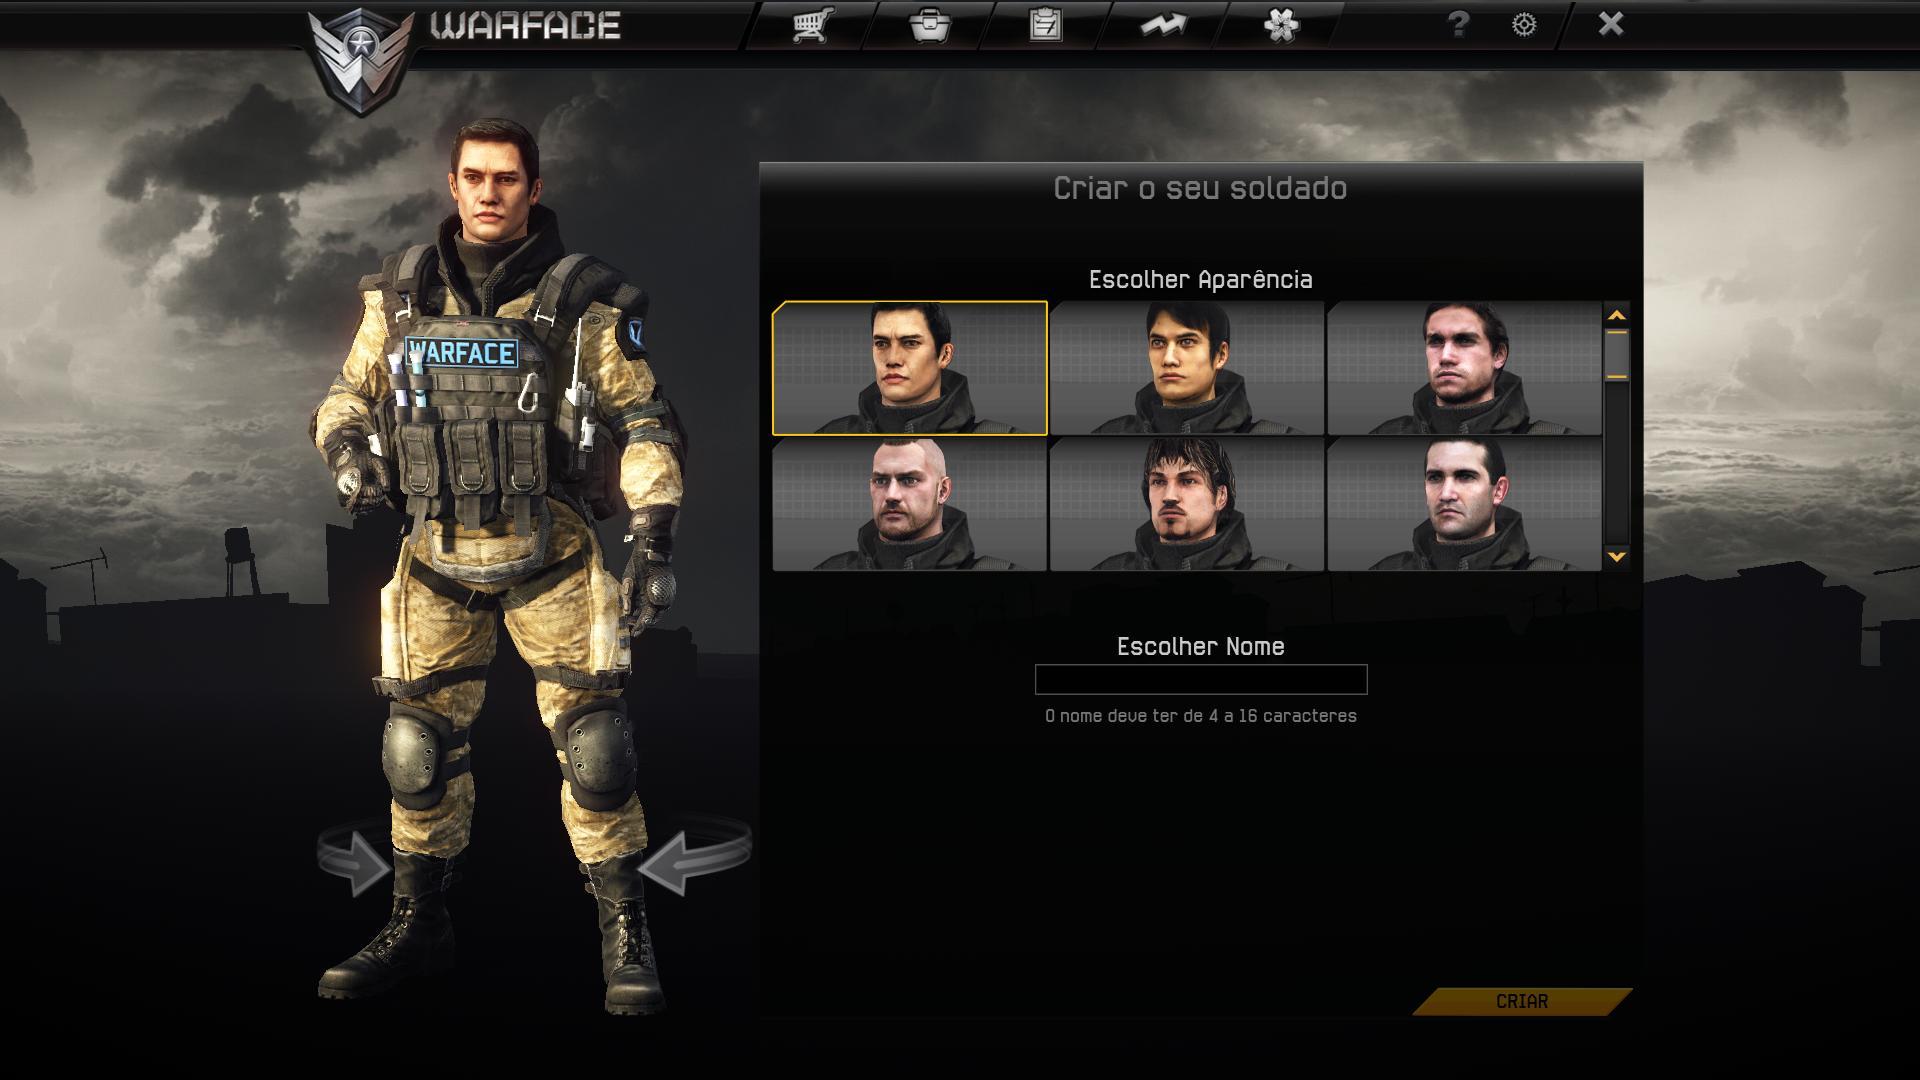 Warface - Imagem 2 do software